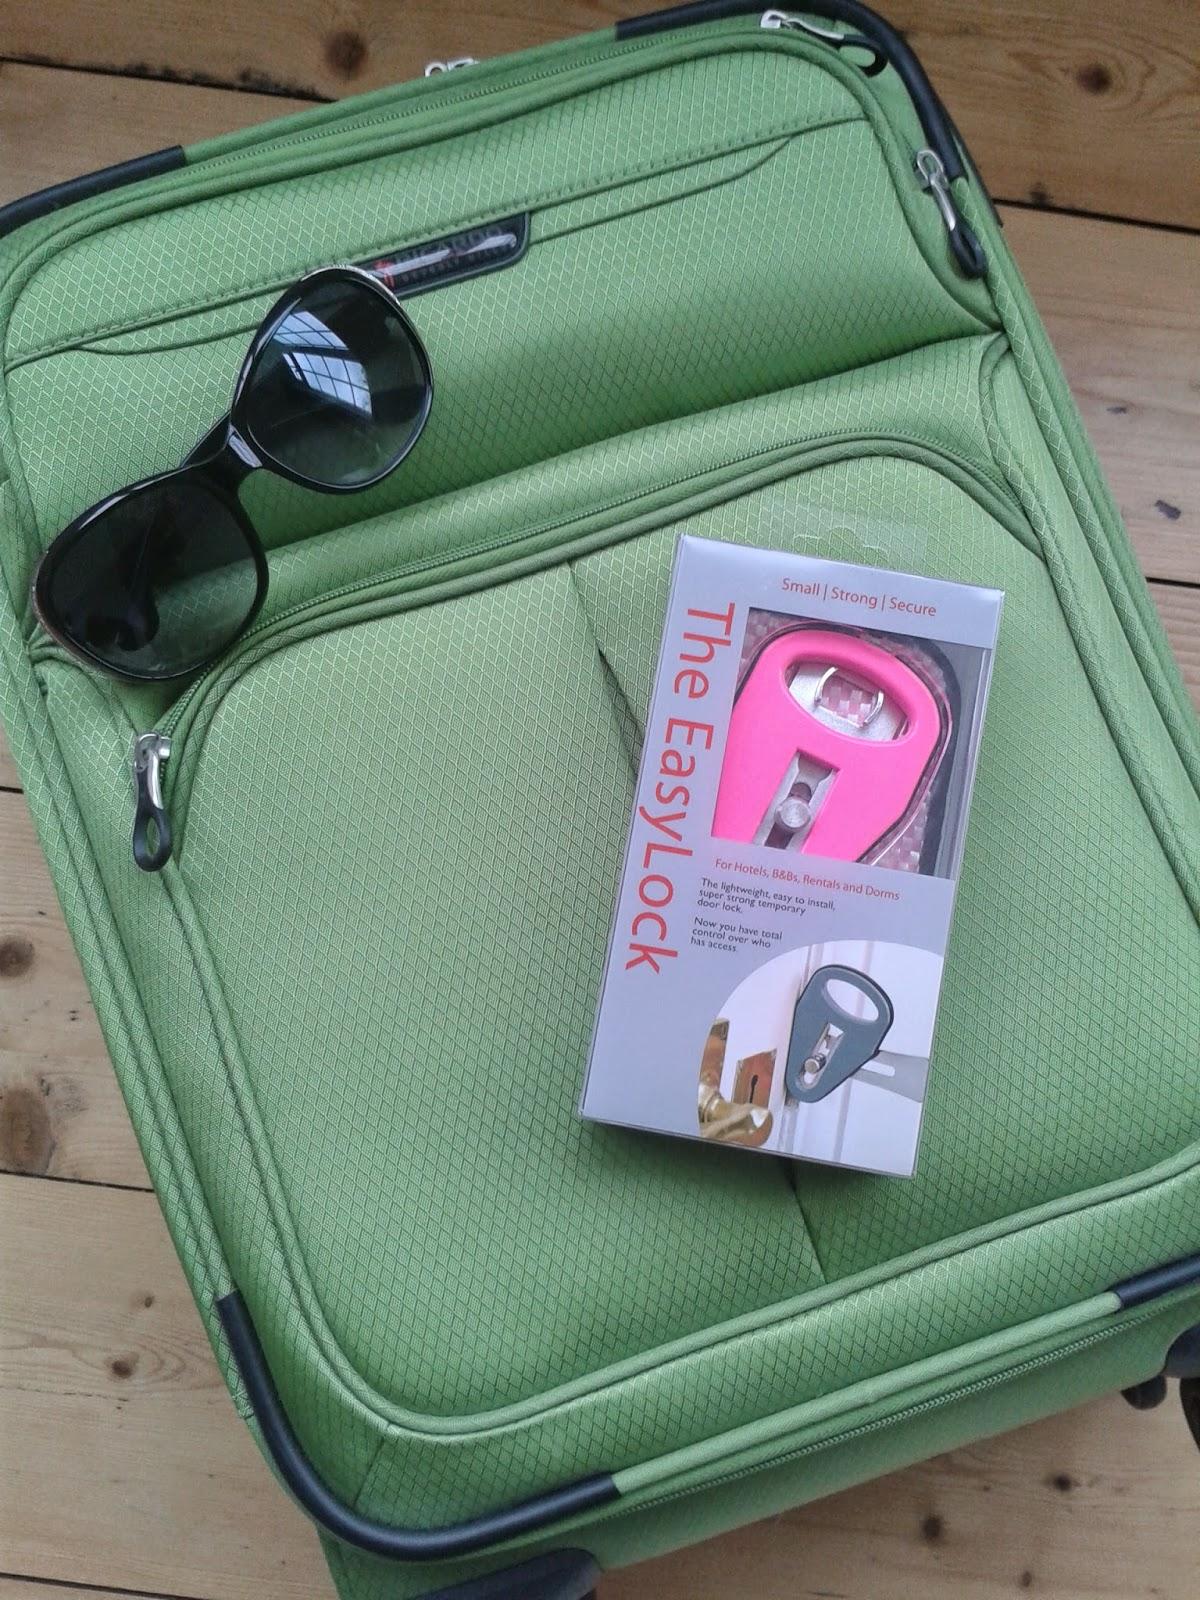 The Easy Lock portable door lock